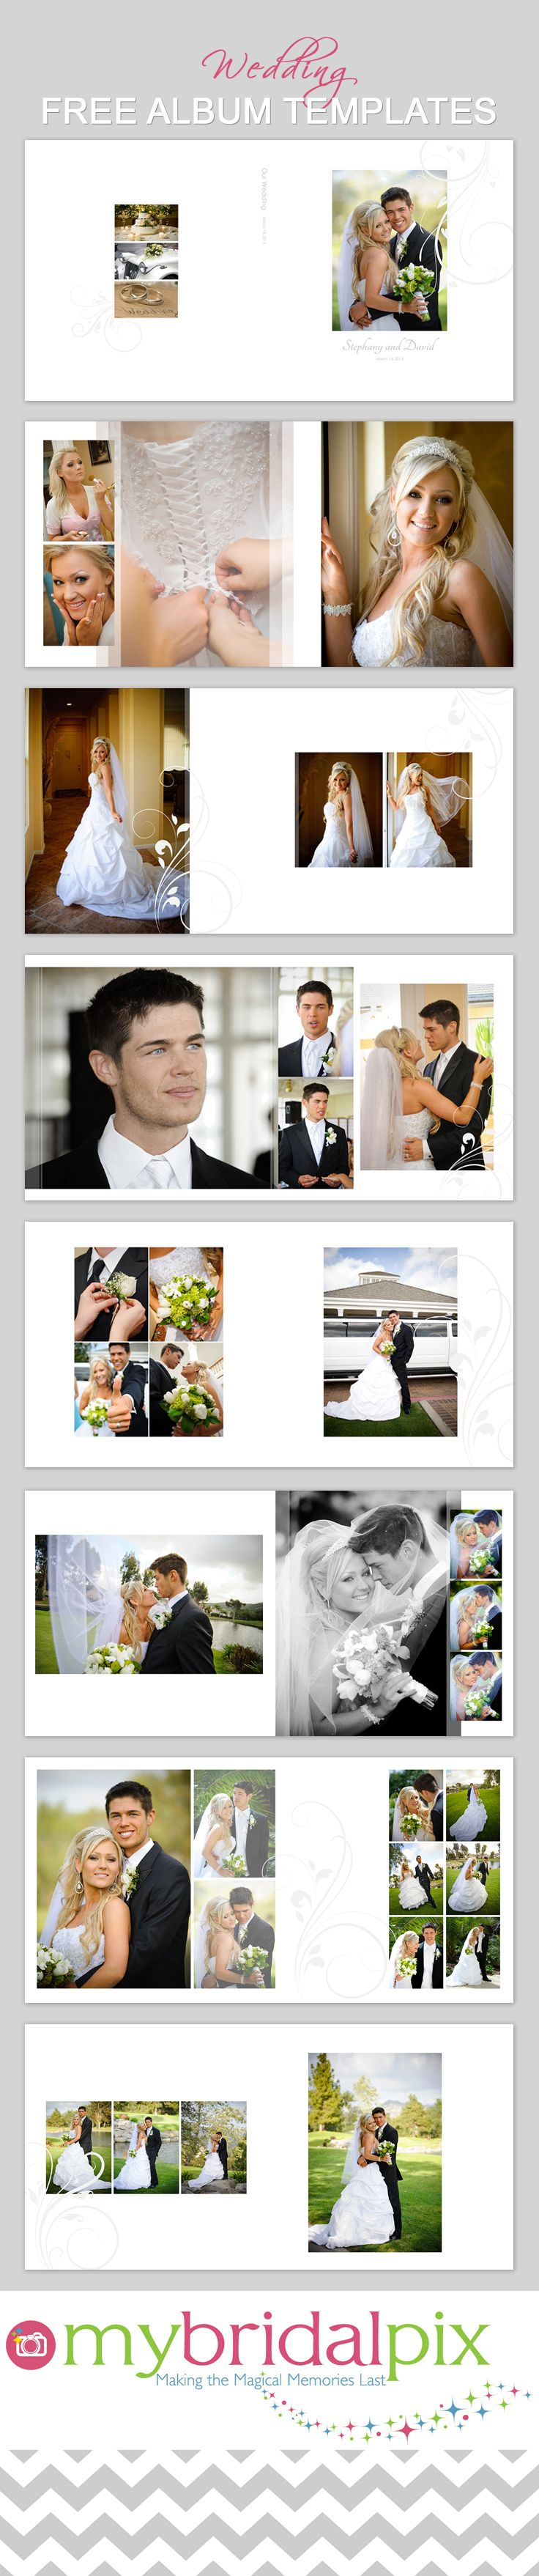 wedding album designer software